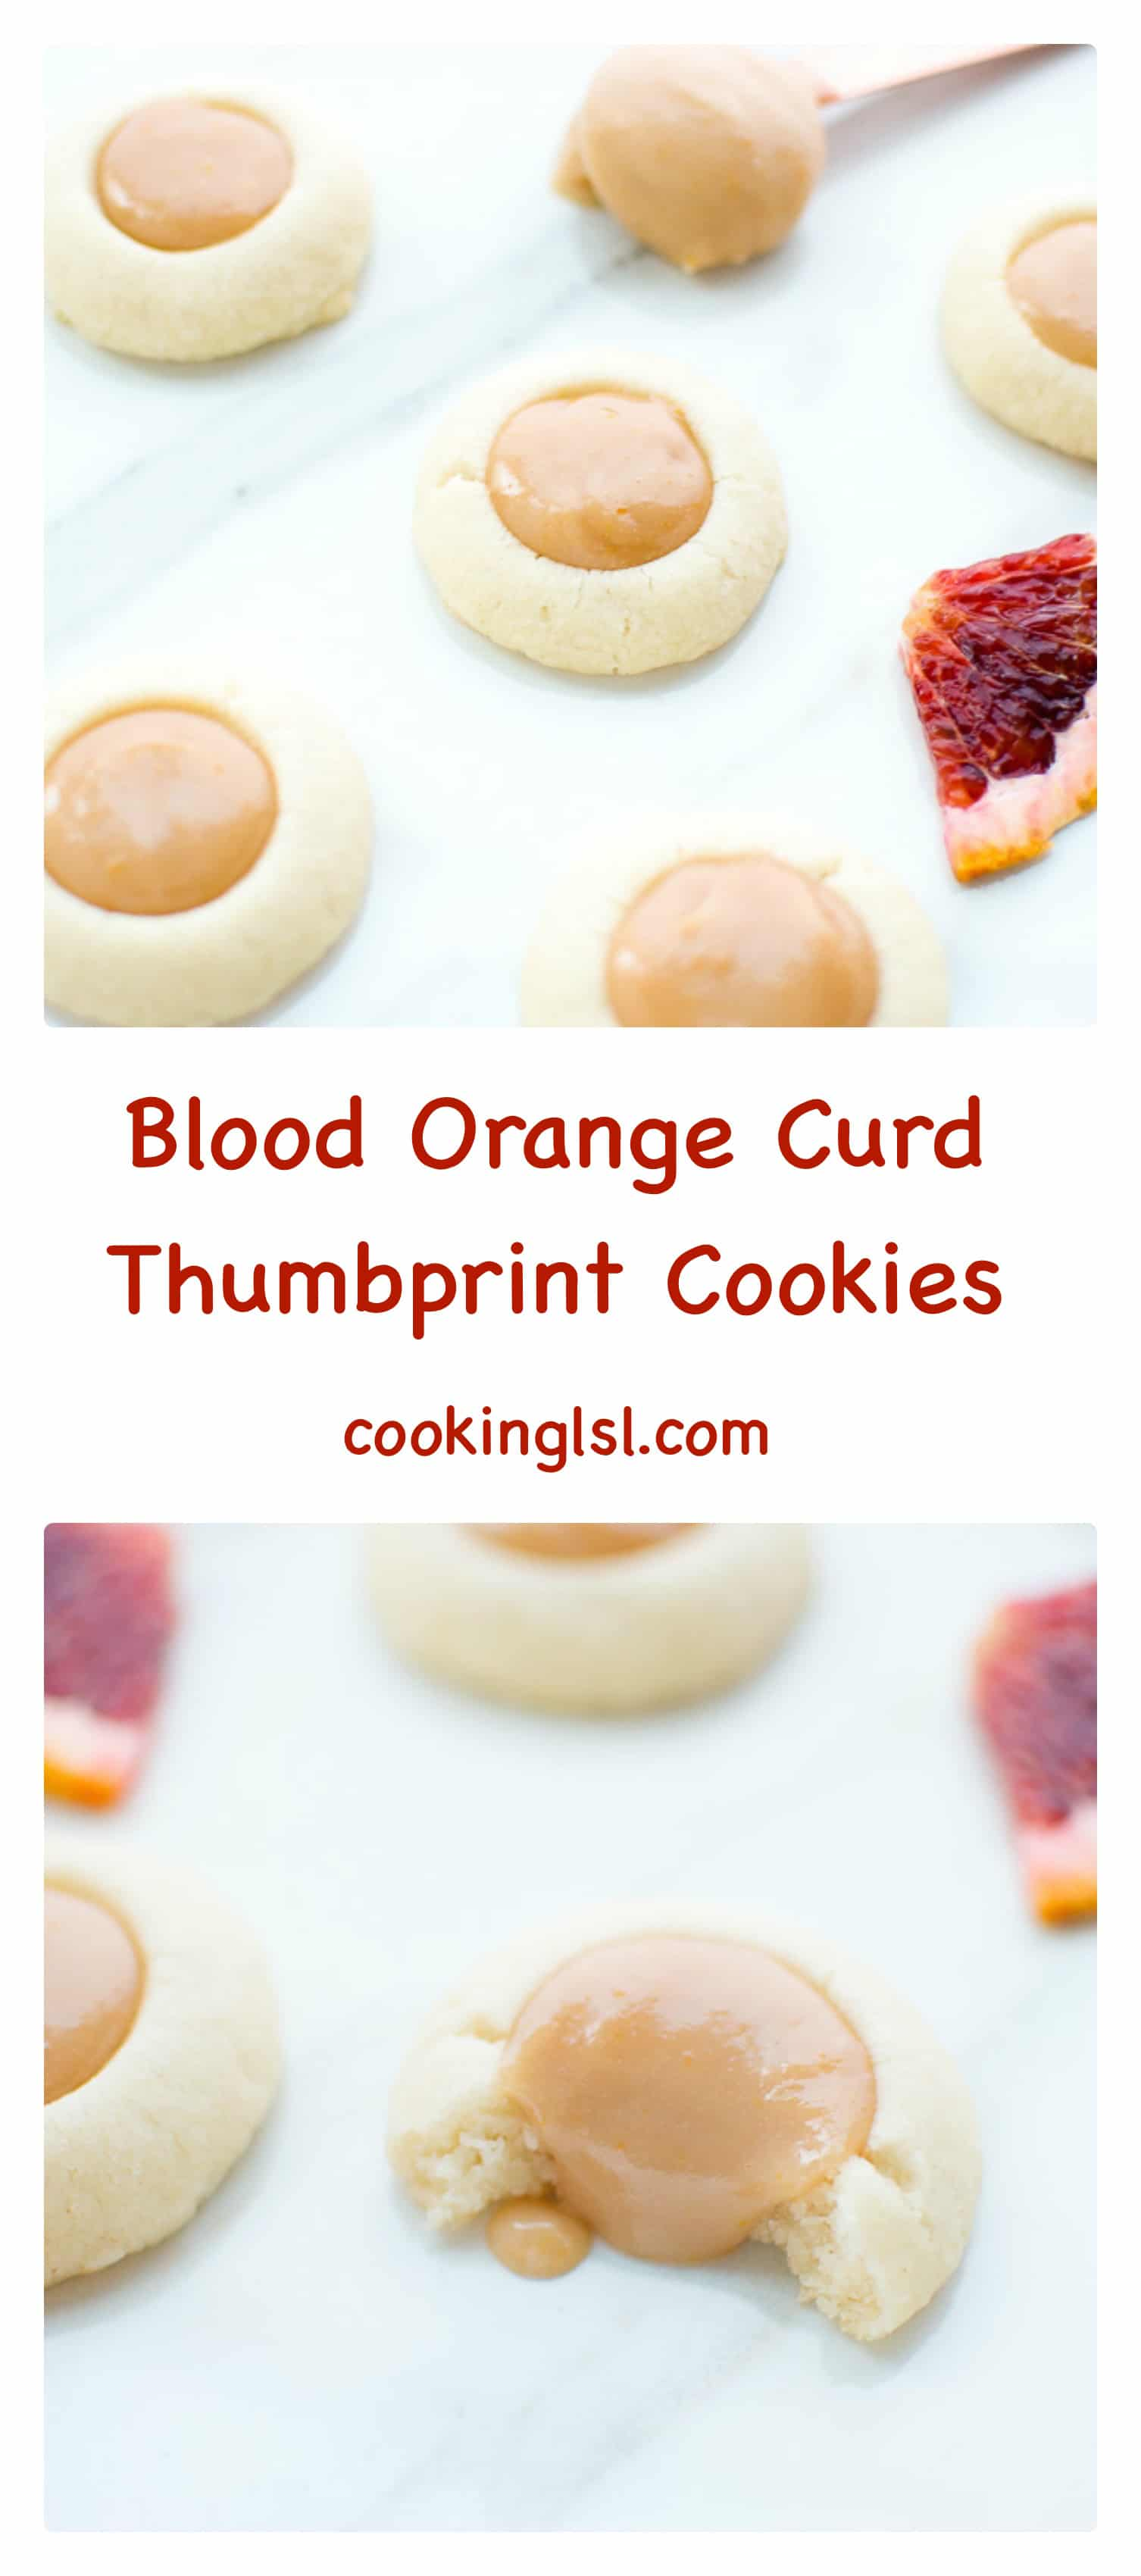 Blood-Orange-Filled-Thumbprint-Cookies